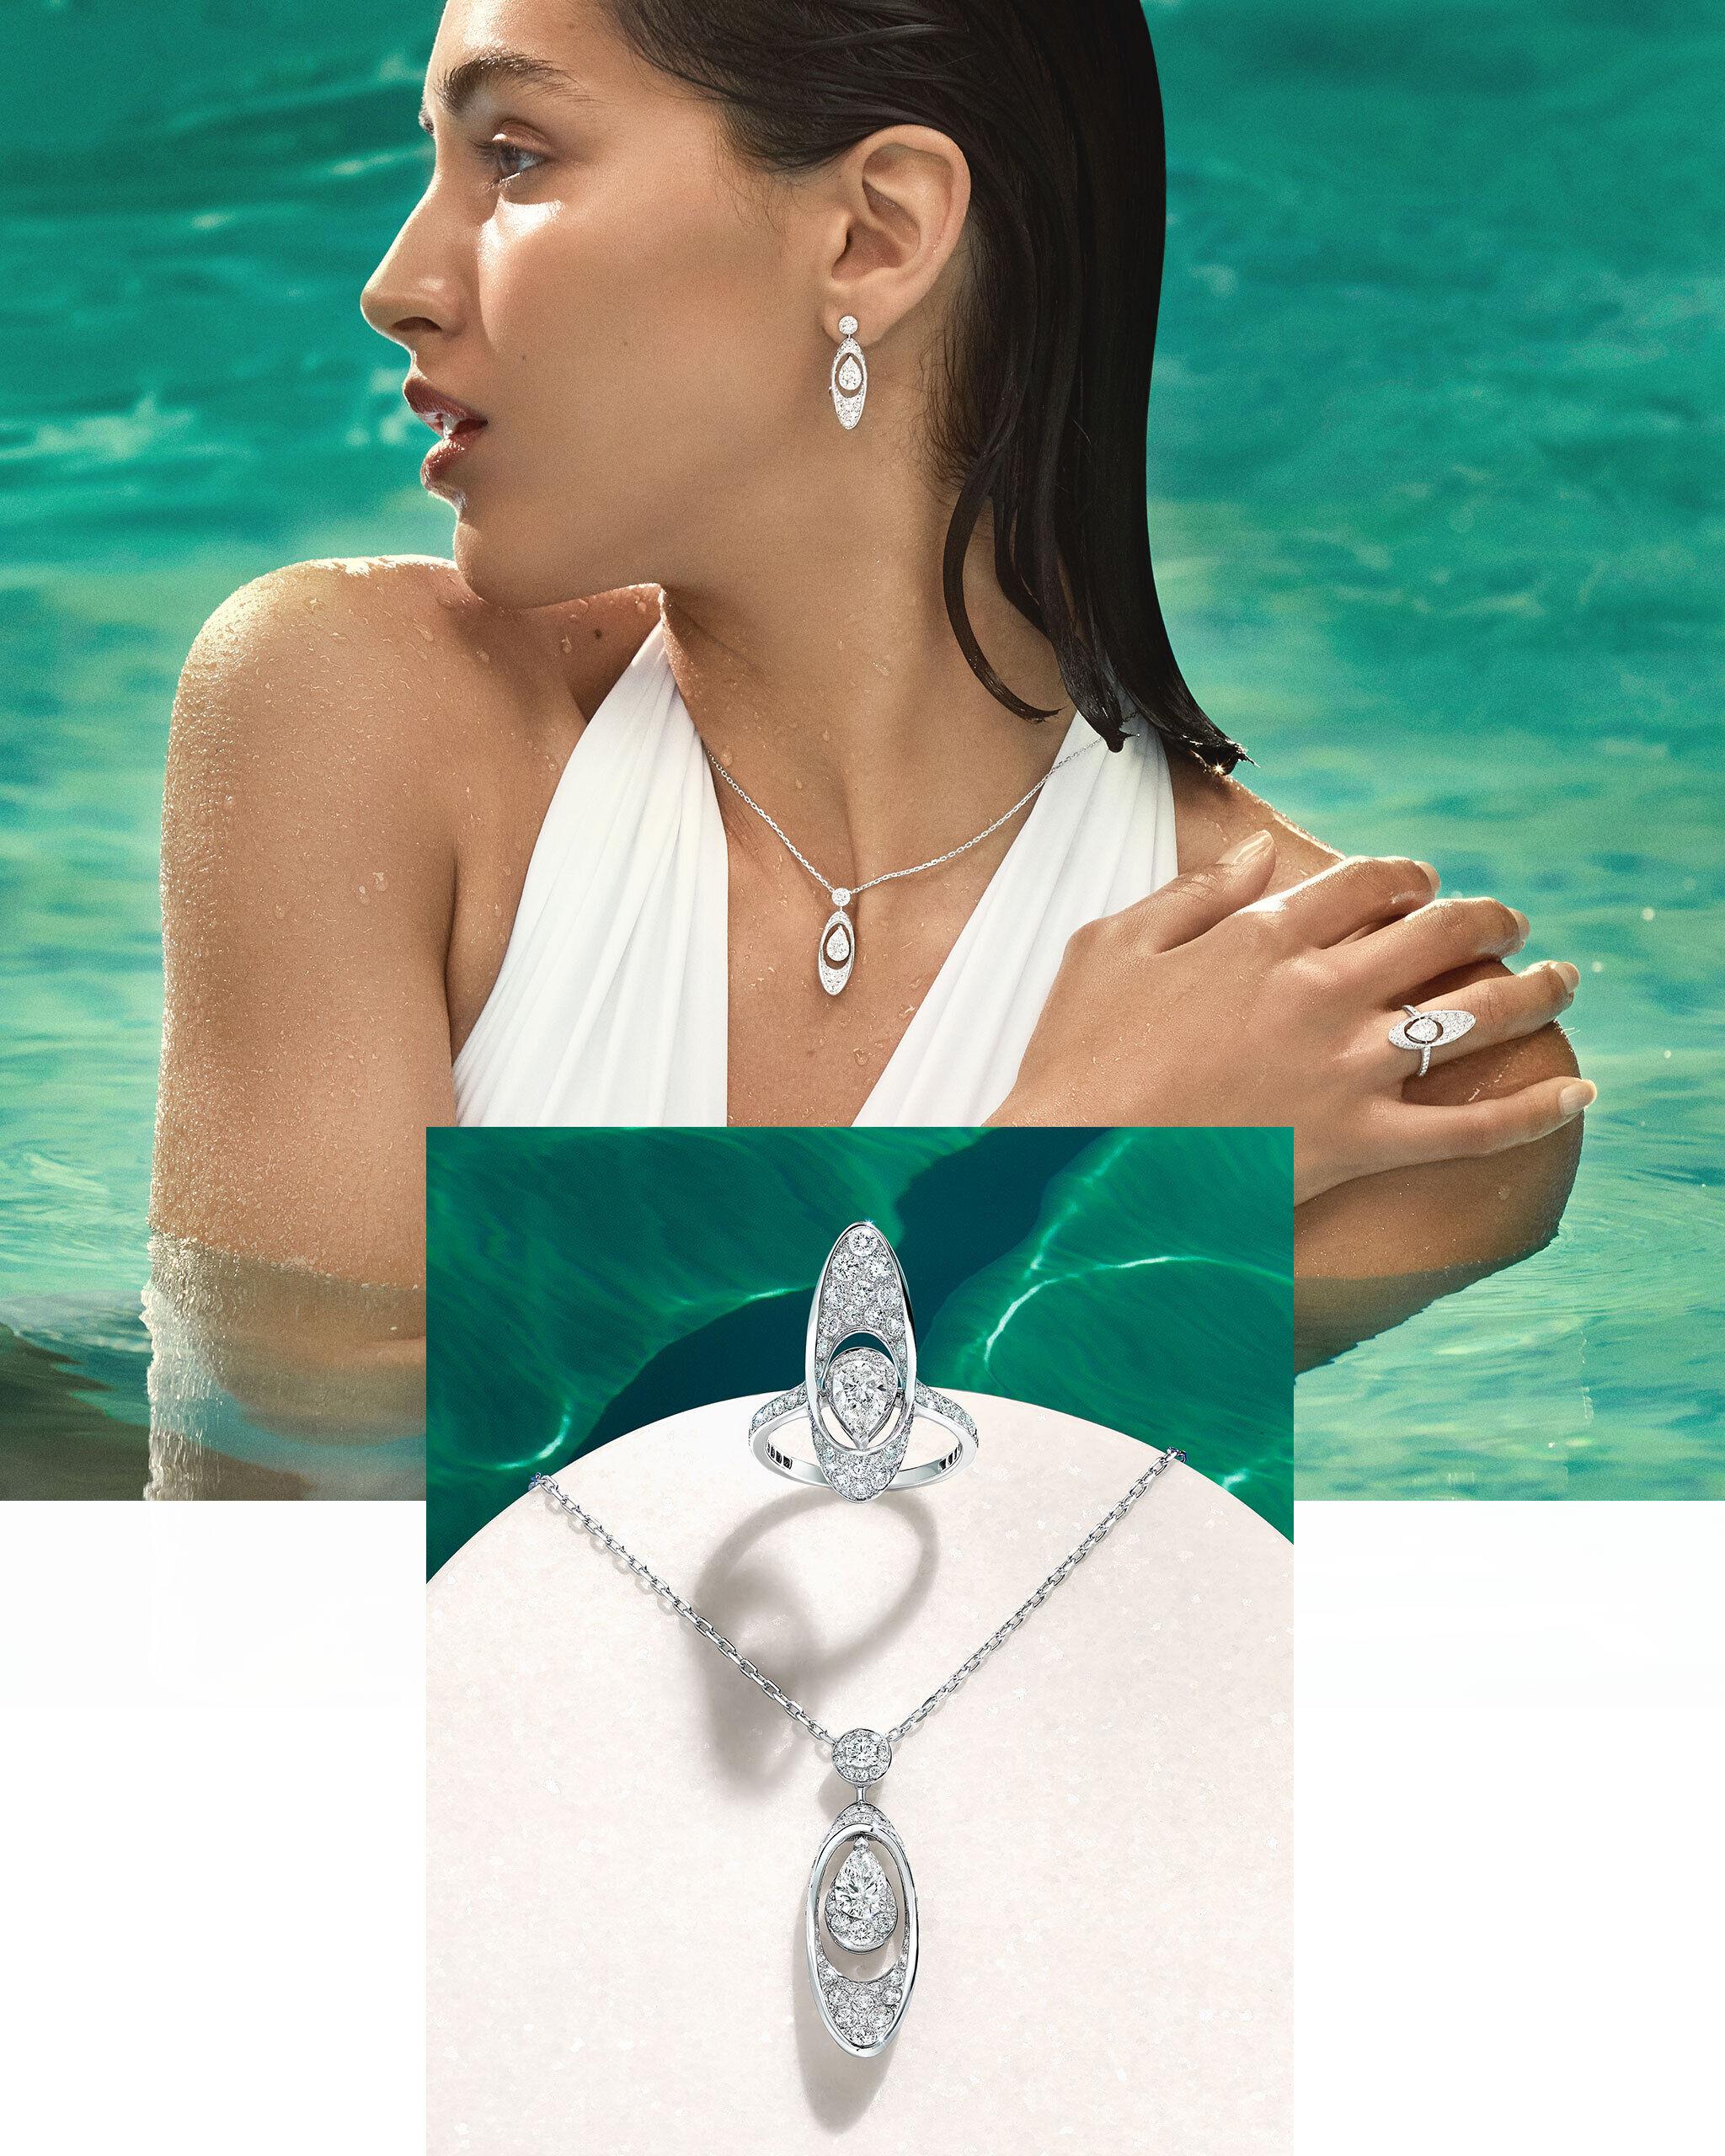 Model wears Graff Tribal collection diamond jewellery in a pool